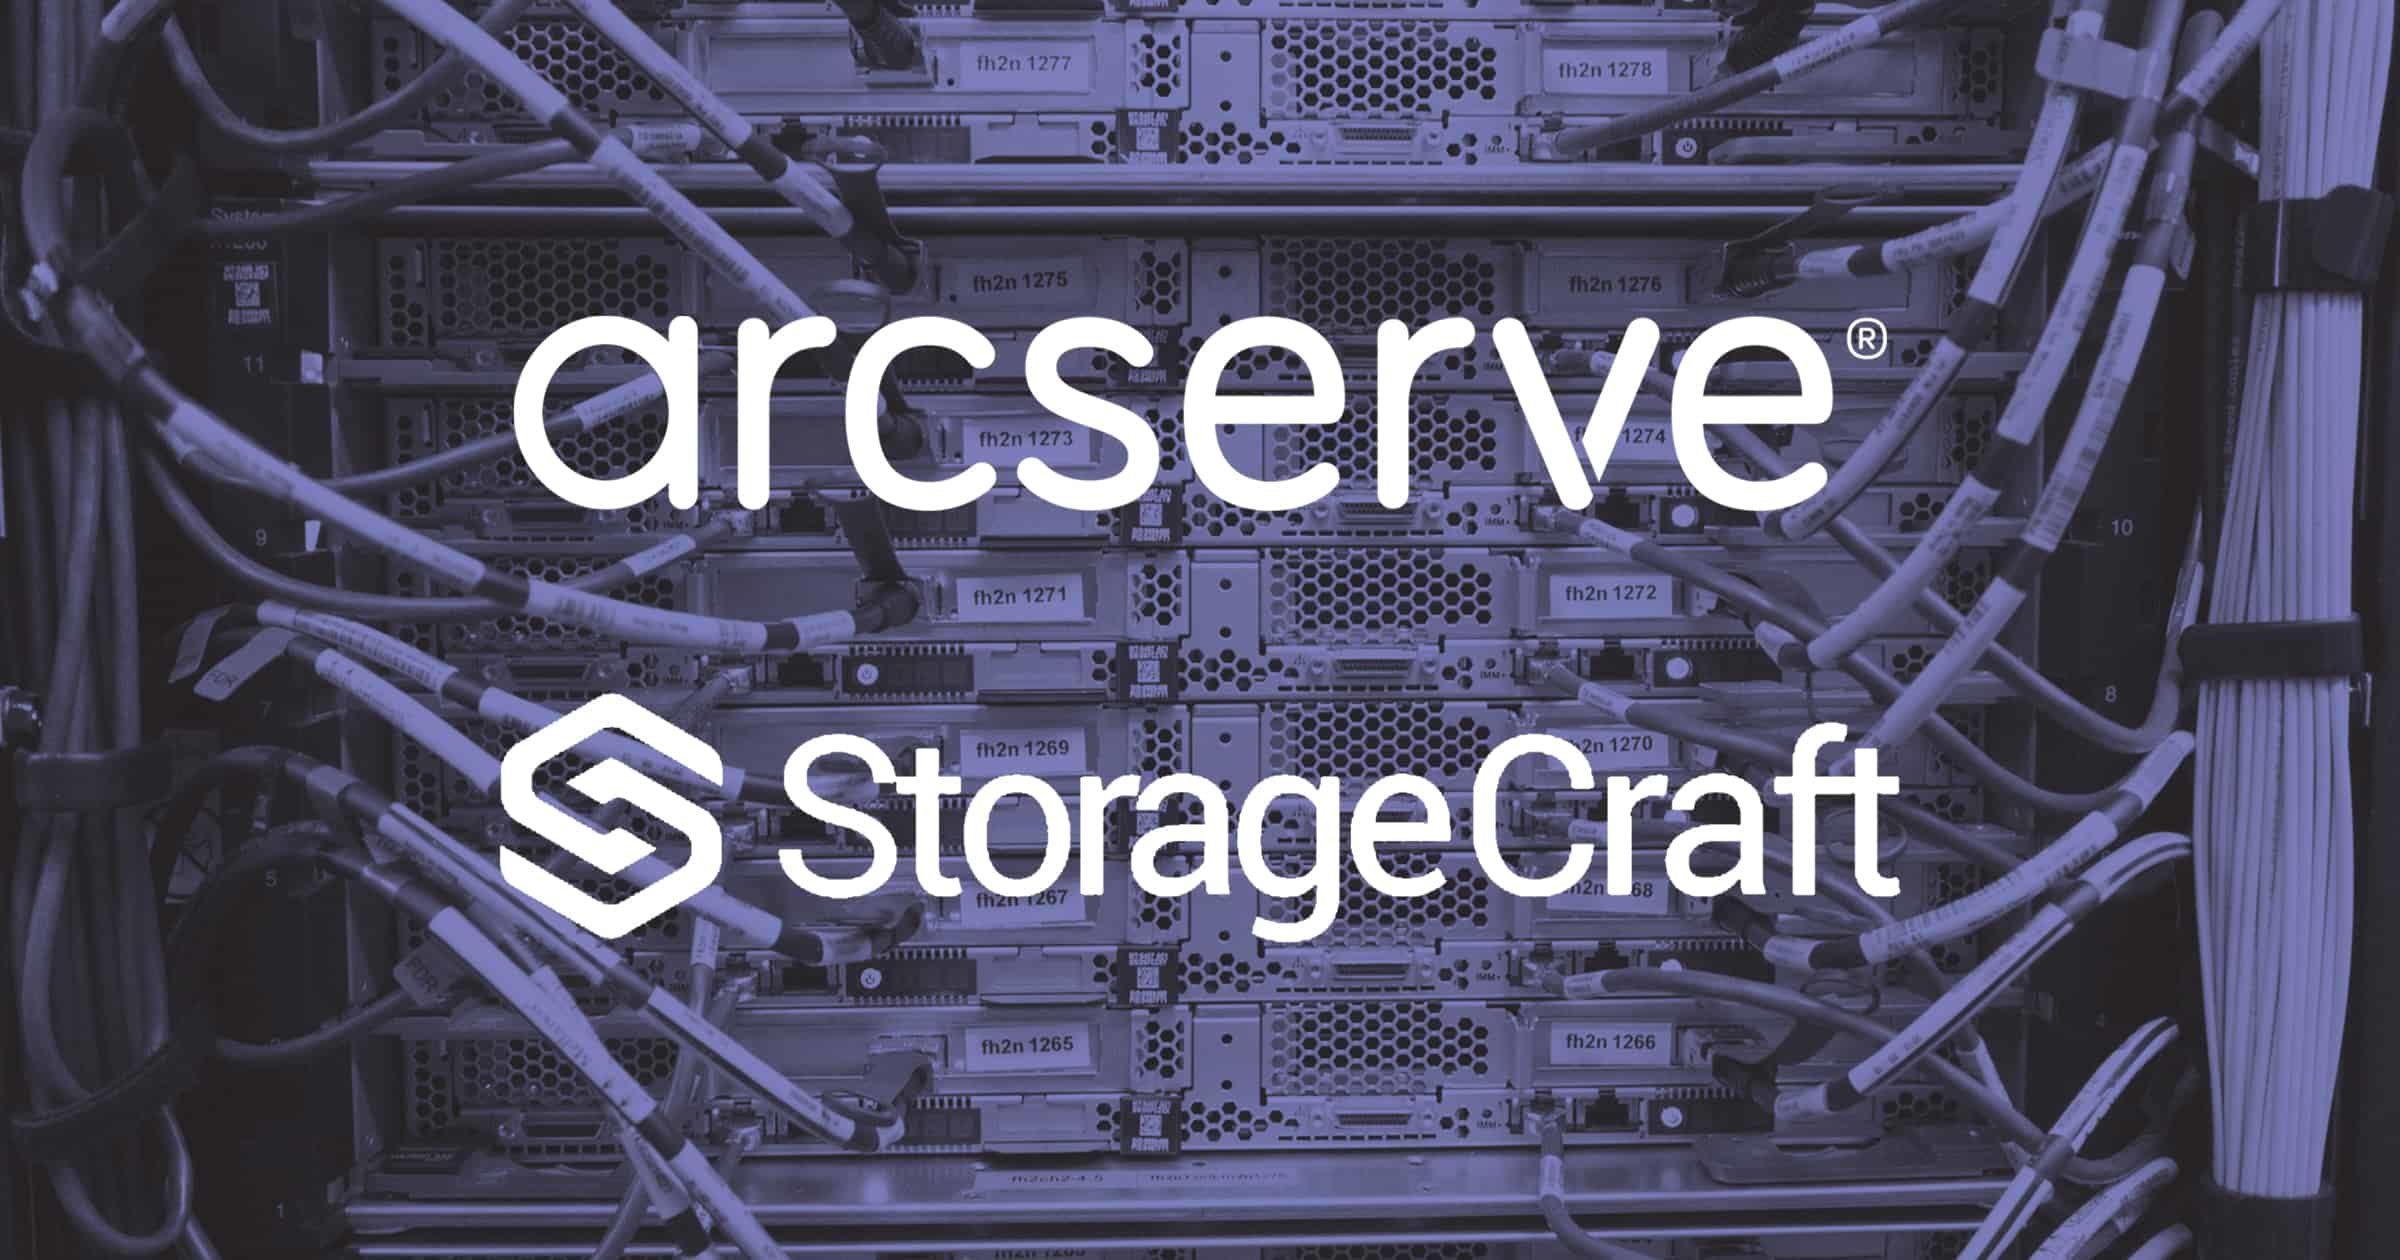 Arcserve and StorageCraft to merge